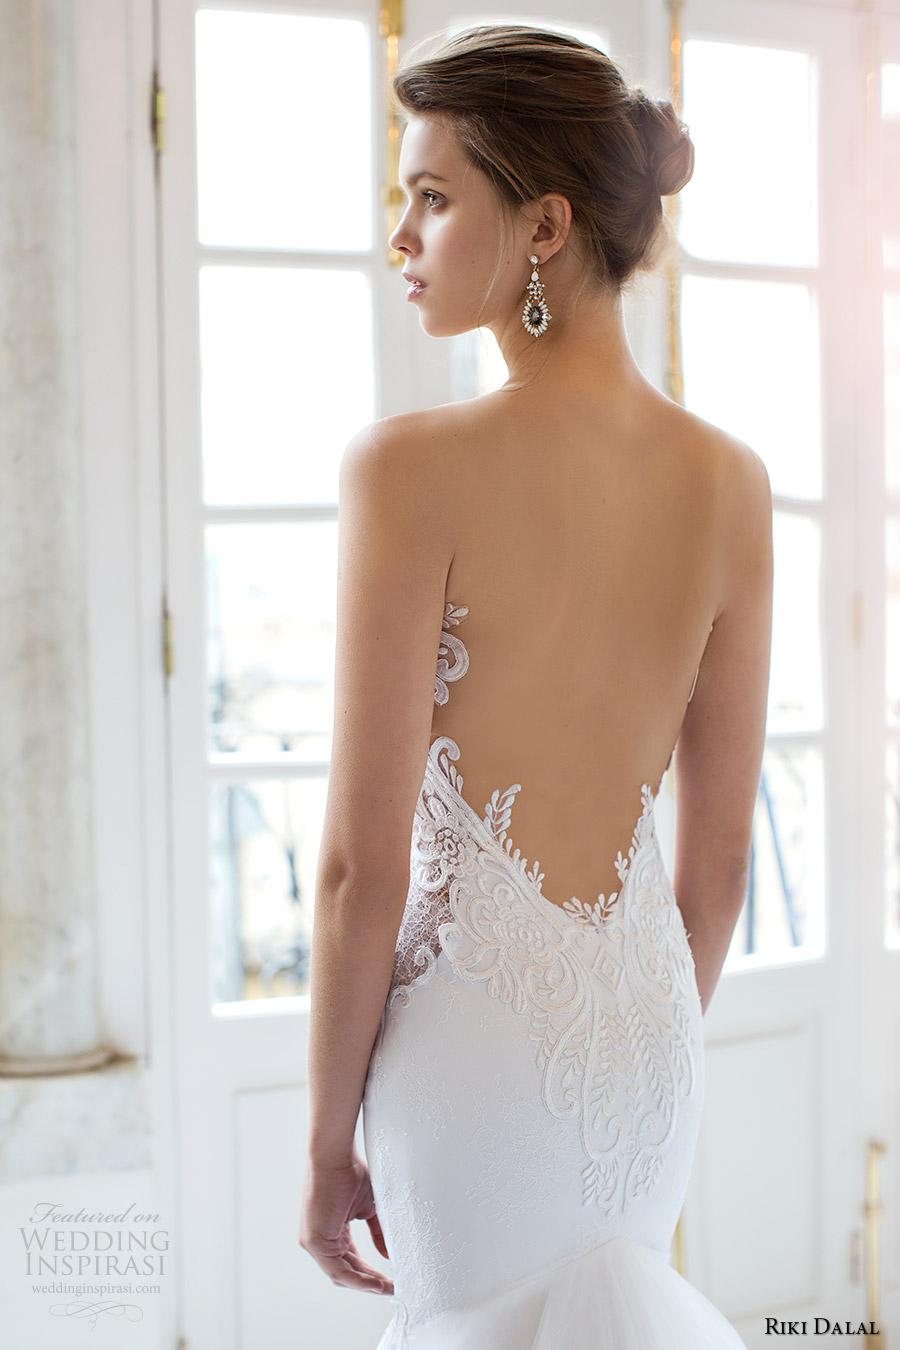 riki dalal bridal 2016 sleeveless plunging sweetheart illusion jewel sheer bodice mermaid wedding dress (1804) zbv low back sexy glam long train